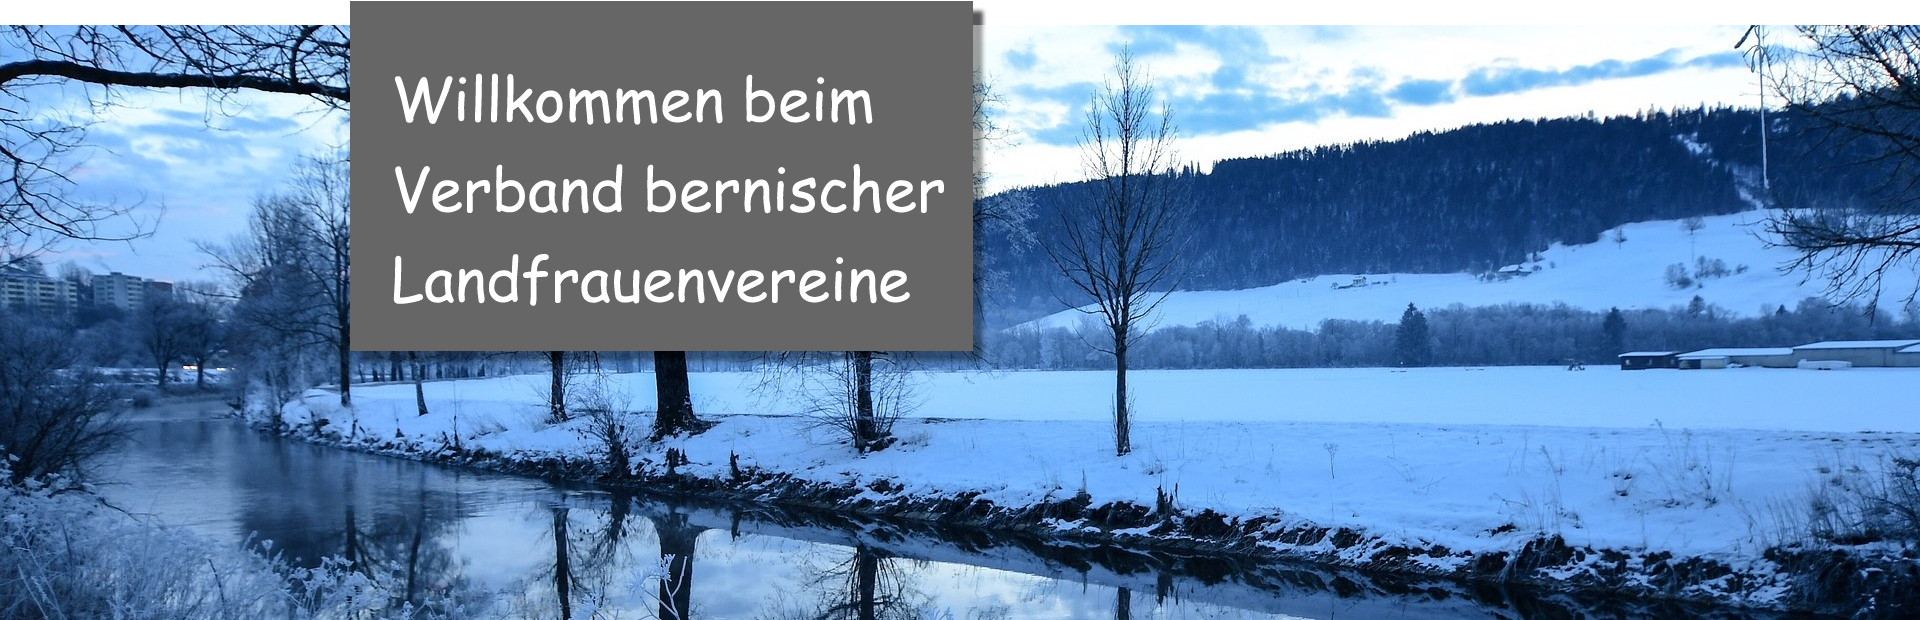 Fluss_Willkommen